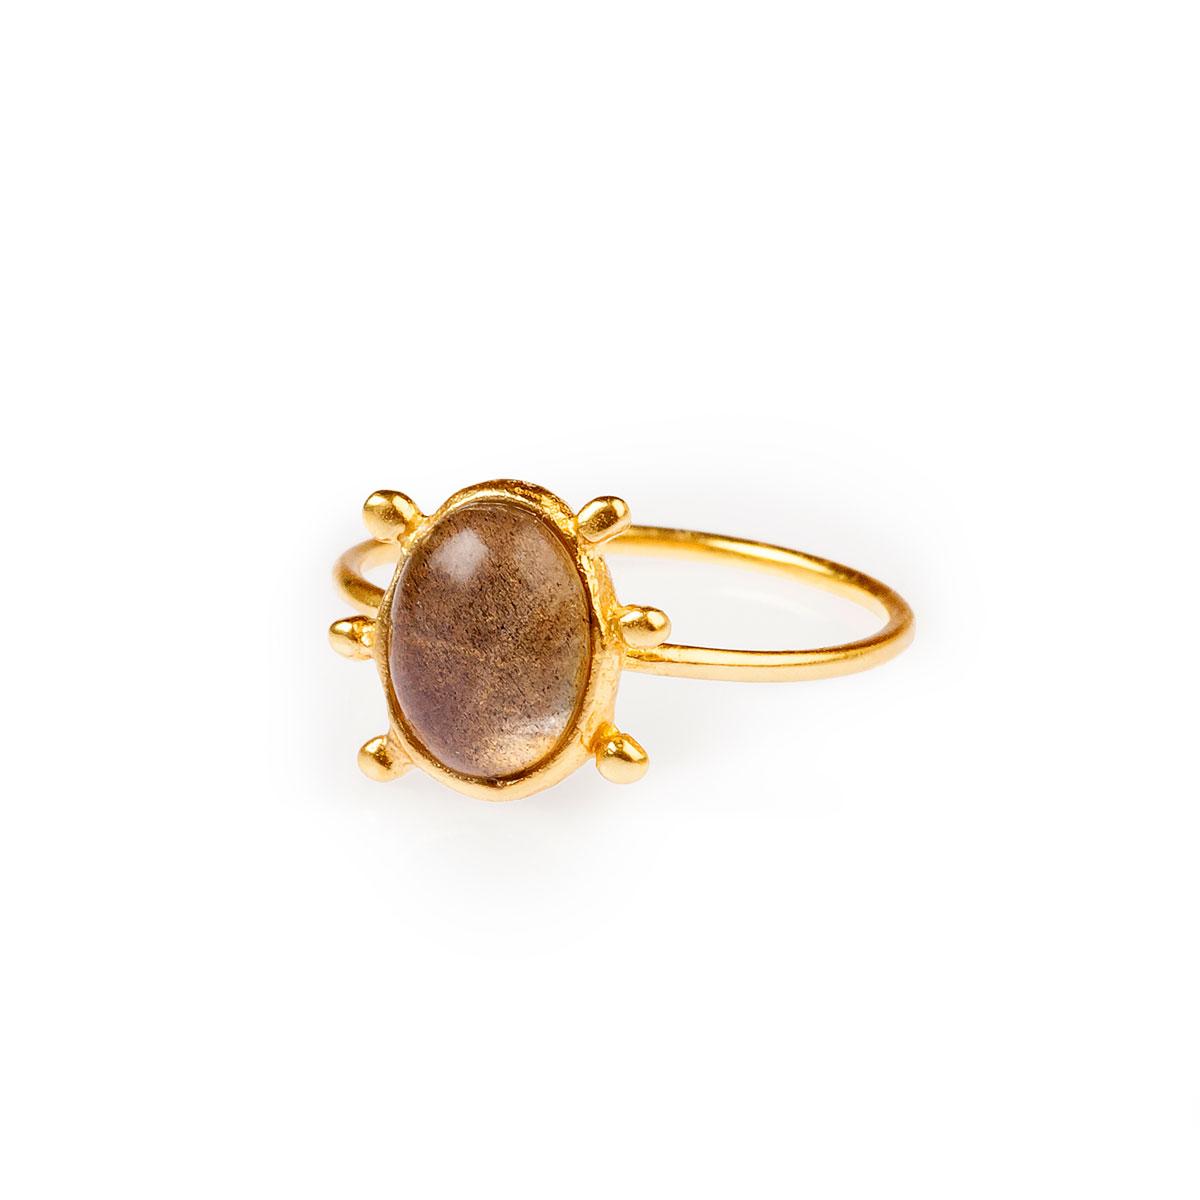 Labradorite-ring_danai-giannelli1